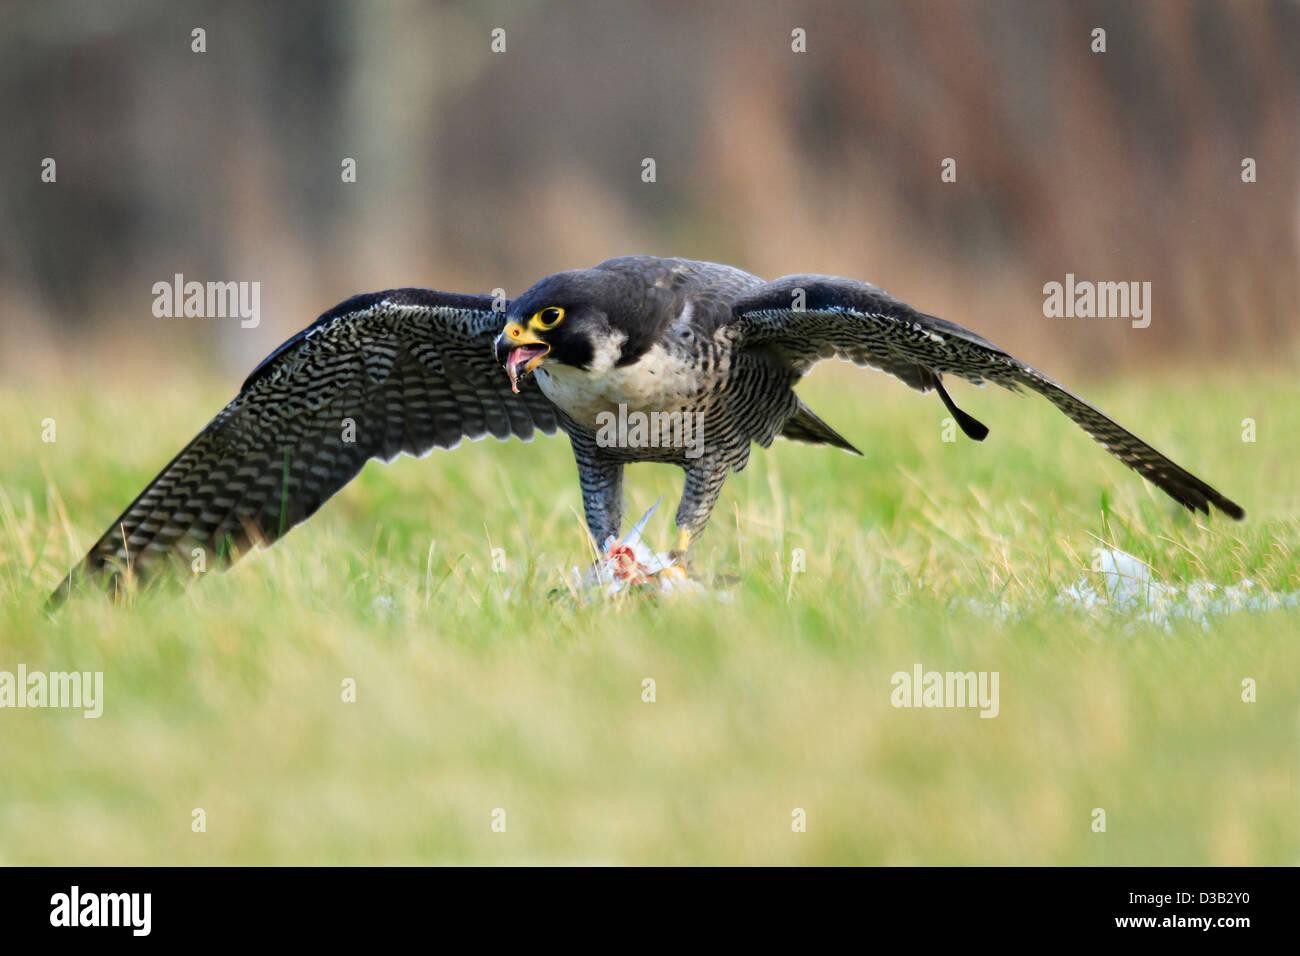 Peregrine Falcon in Scottish Highlands - Stock Image